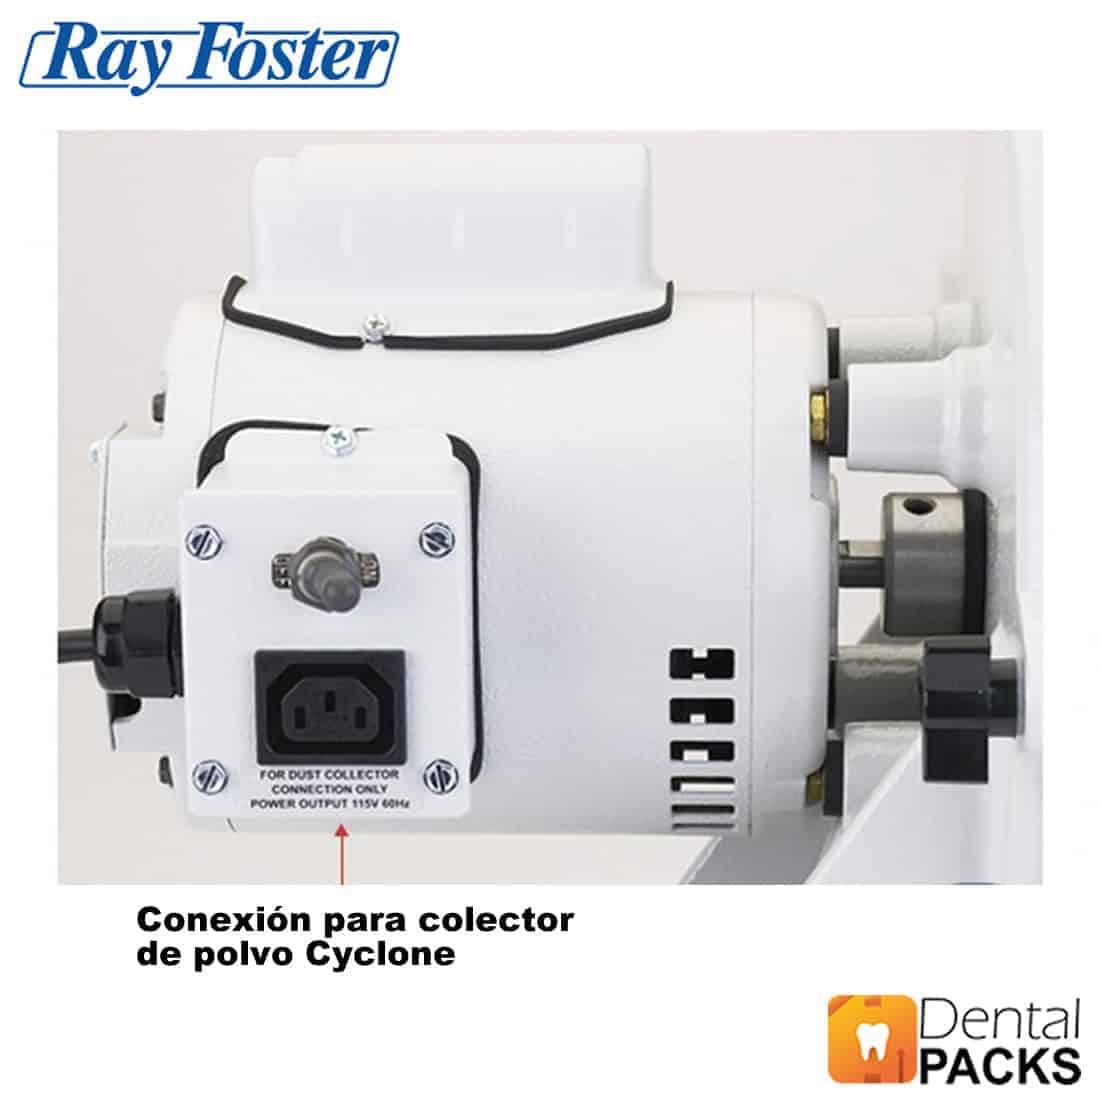 Recortadora-de-modelos-de-yeso-ray-foster-rayfoster-en-seco-deposito-dental-packs-mtd1-vista-trasera